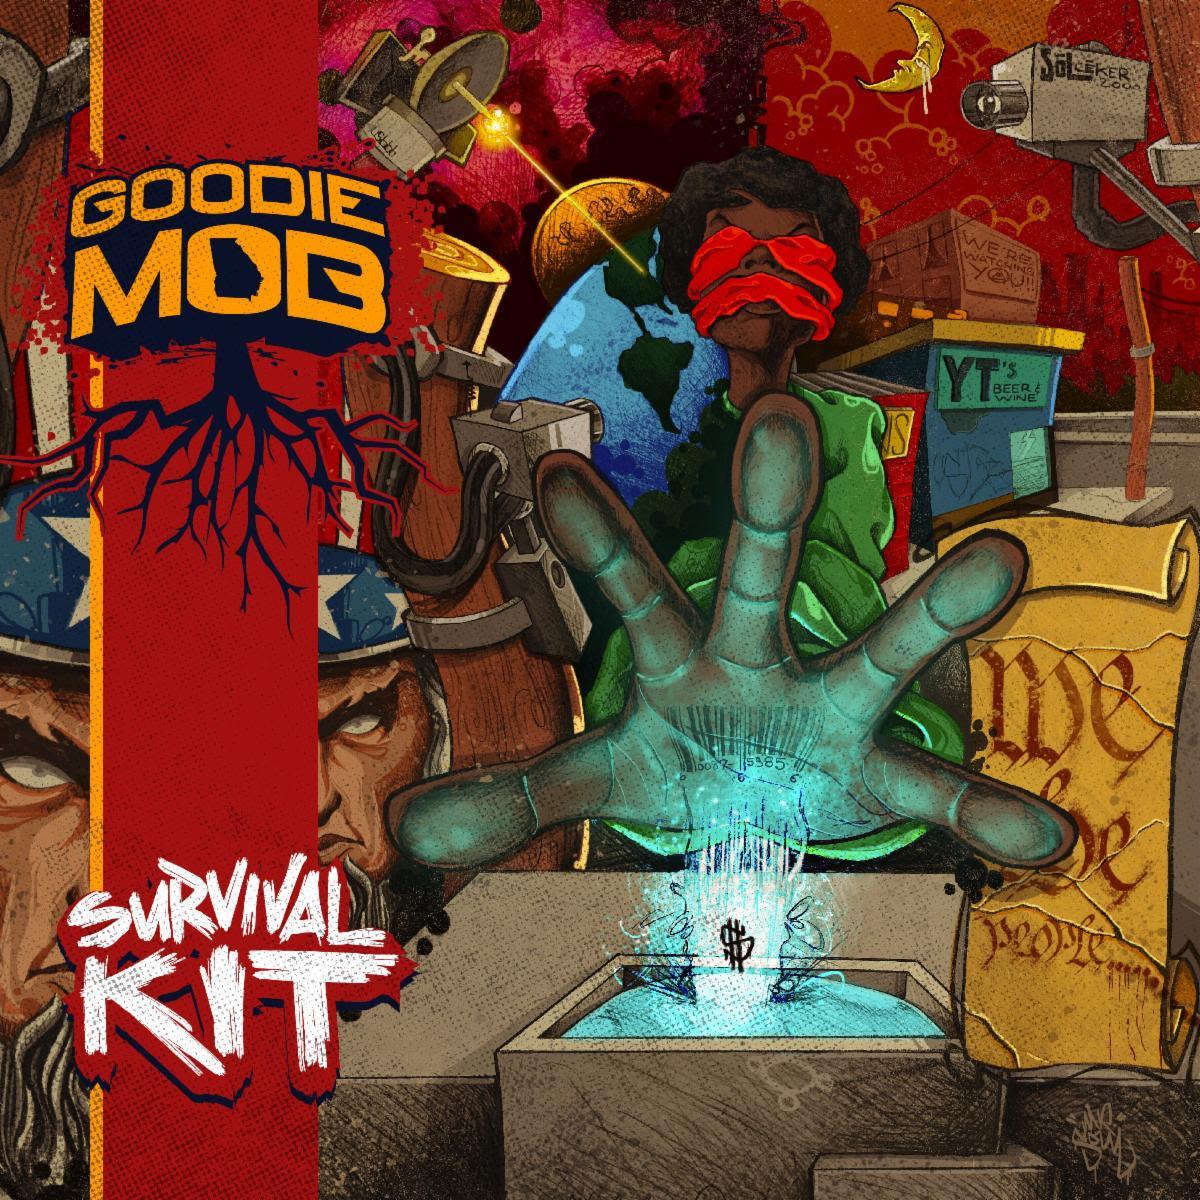 Survival Kit by Goodie Mob album artwork cover art